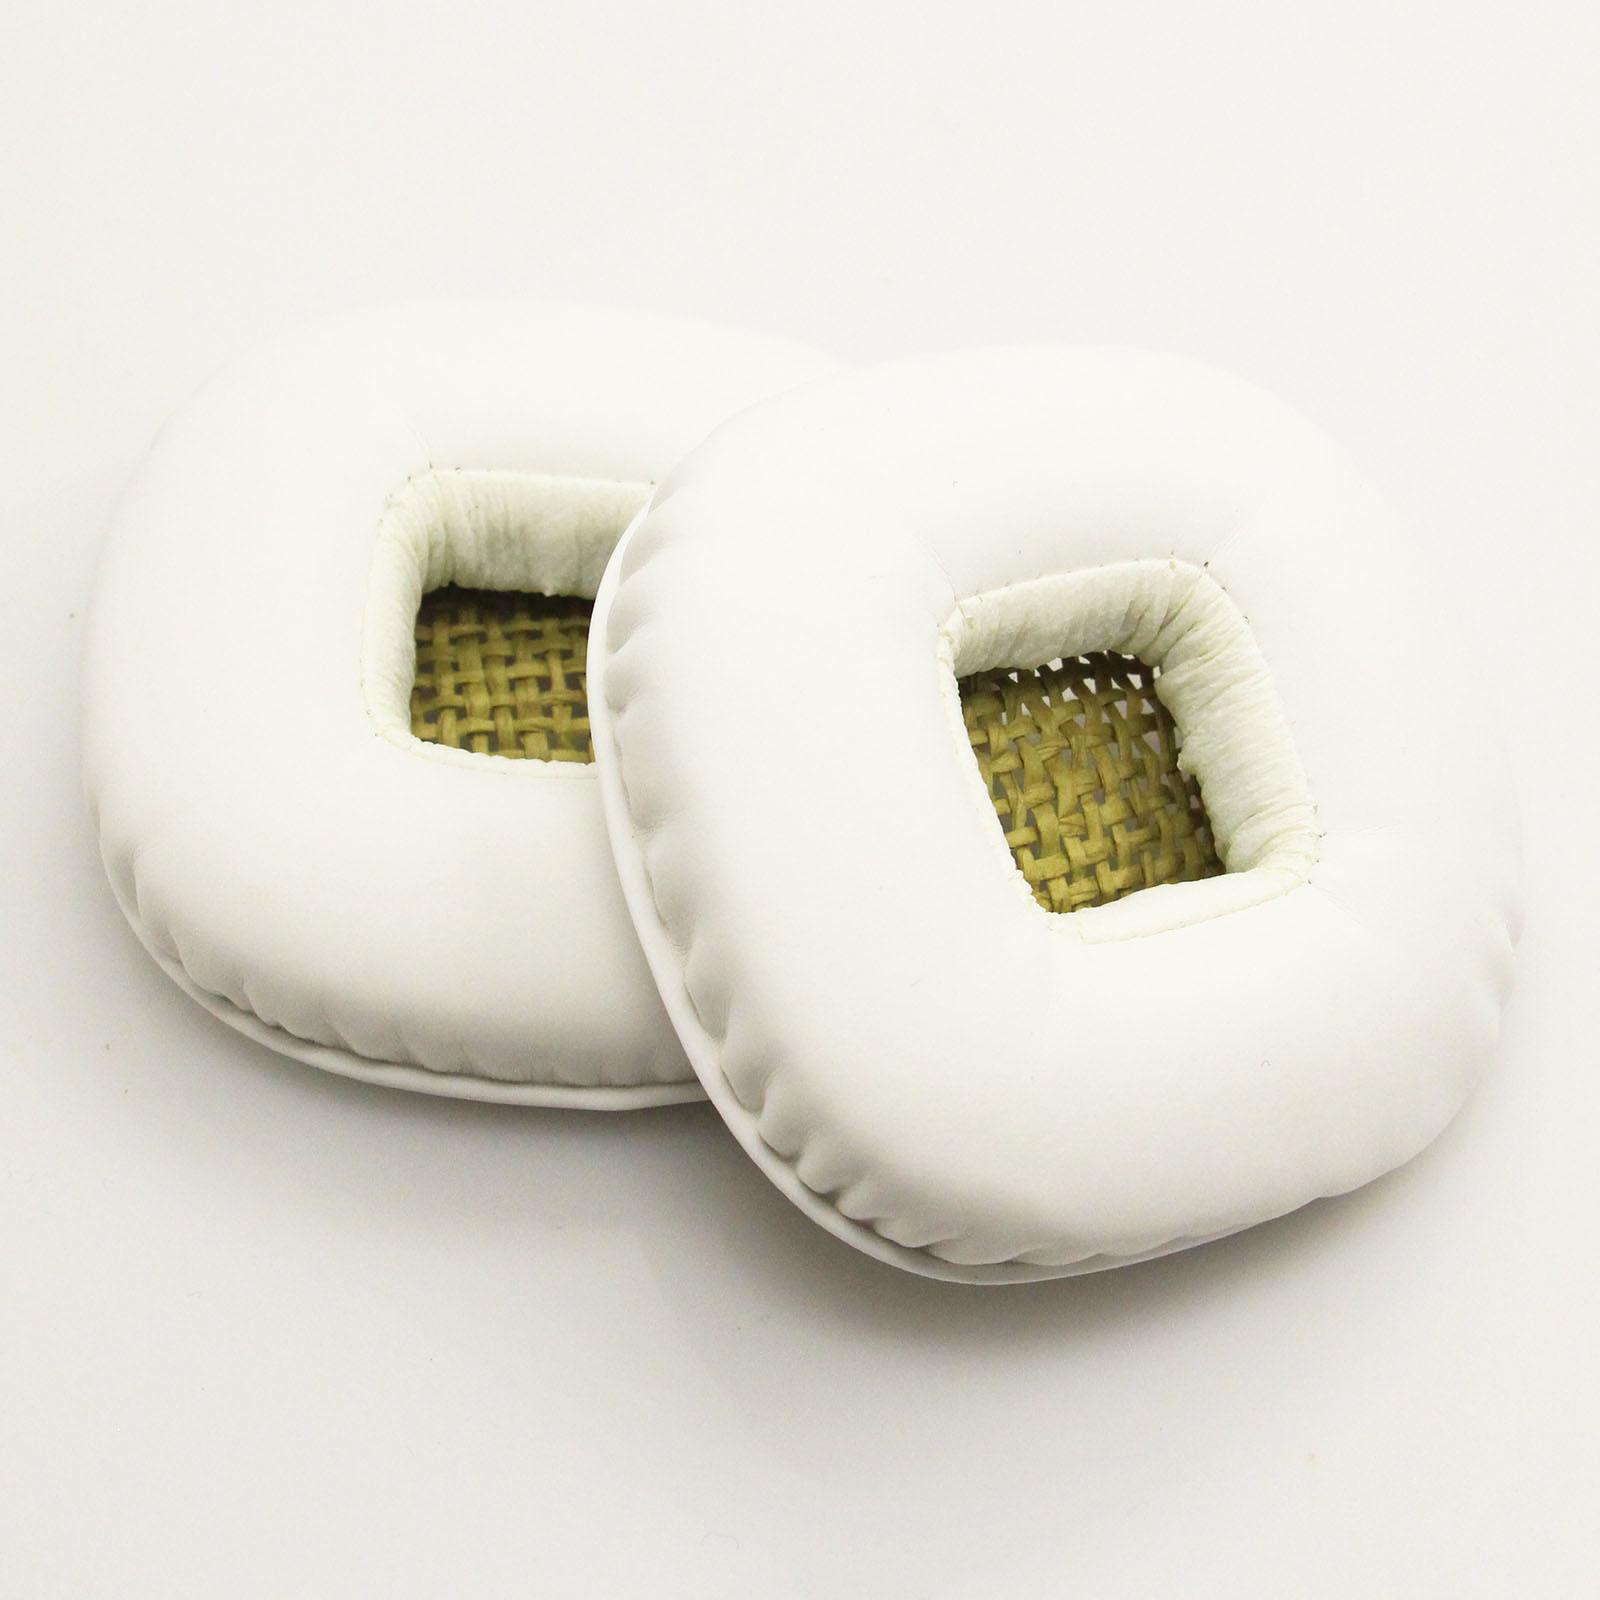 Replacement Headphone Ear Pads Soft Sponge Cushion for Marshall Major 1 2 Headphone Accessories Earpads I II Headset white